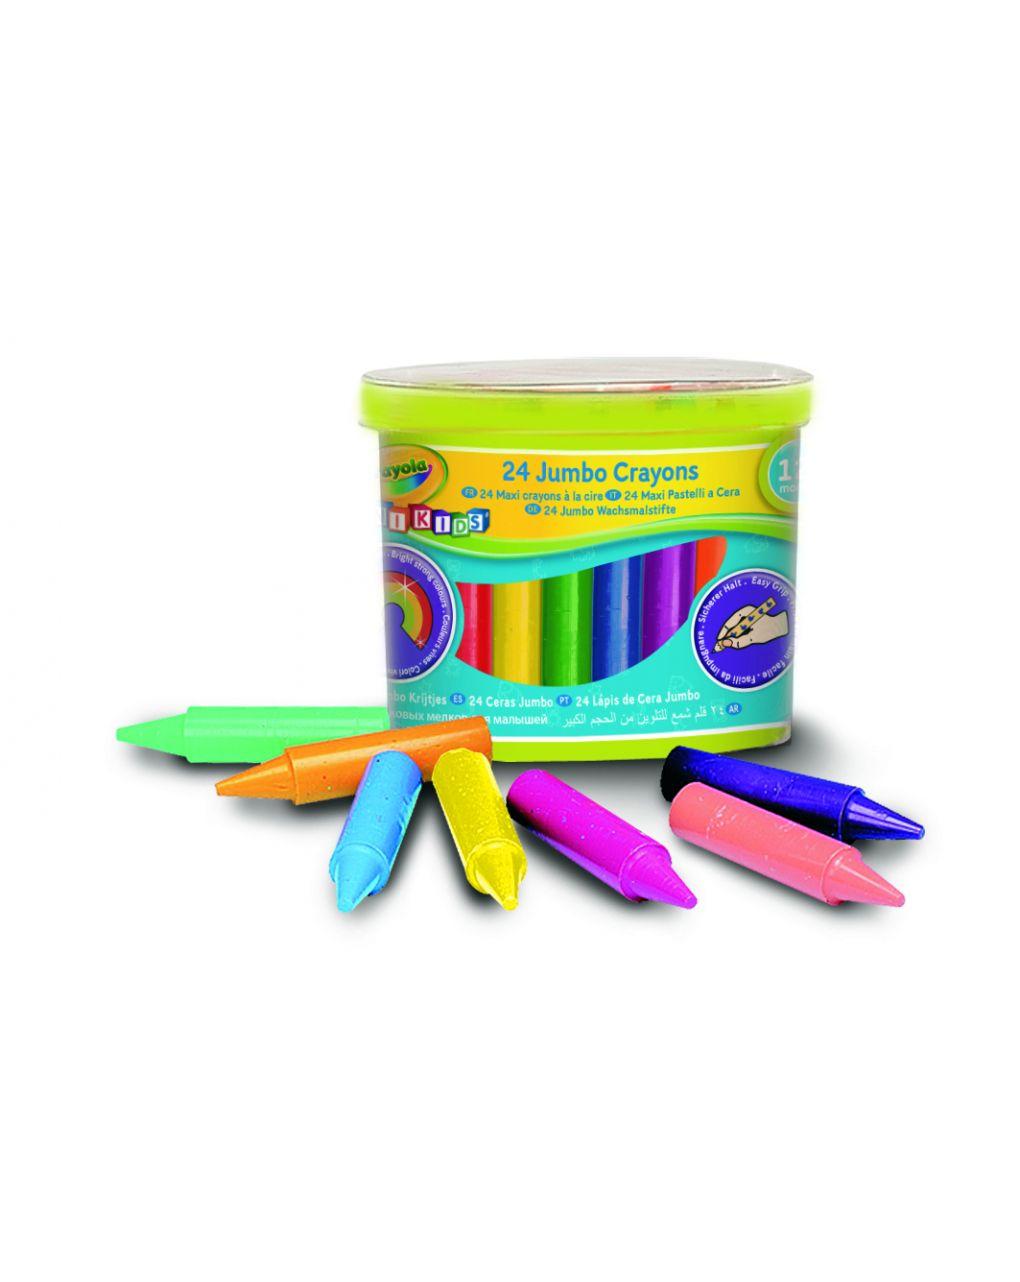 Crayola - 24 lápis de cera mini kids maxi - Crayola